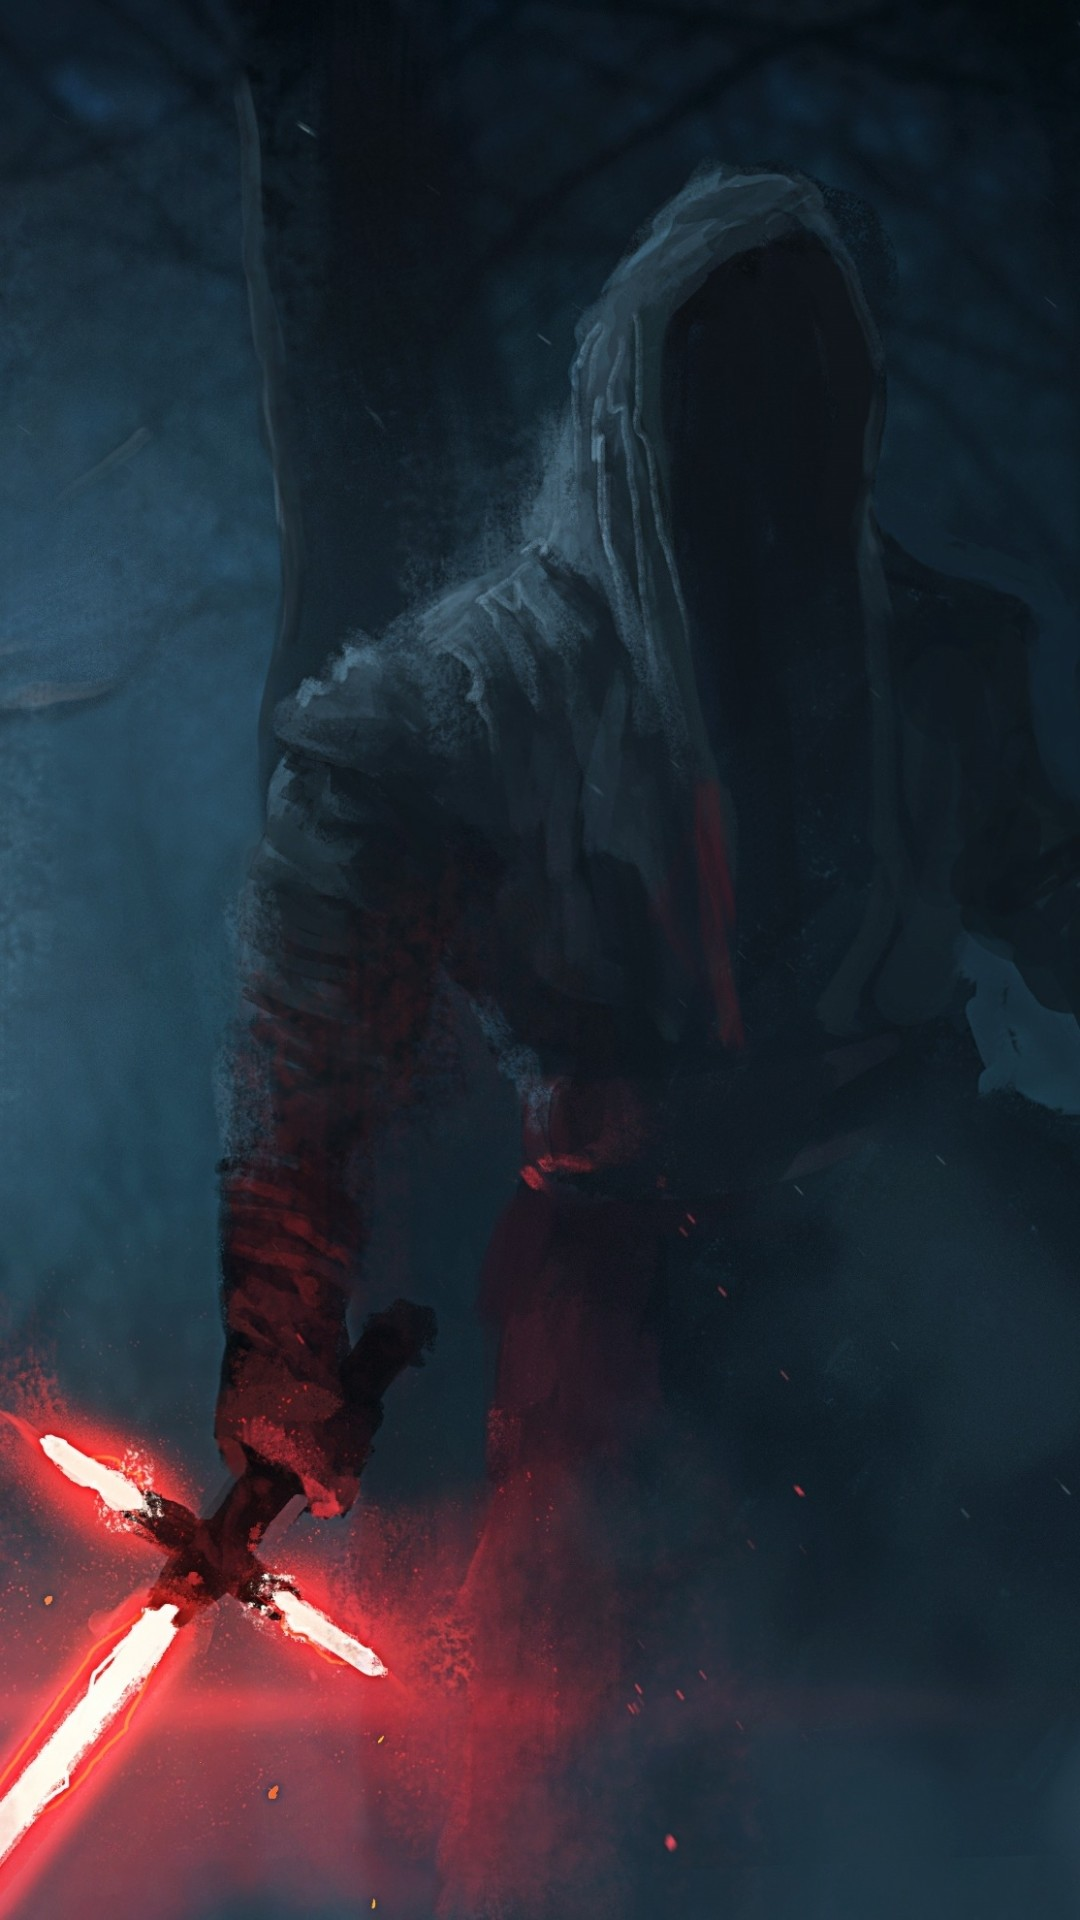 Star Wars The Force Awakens Wallpaper …